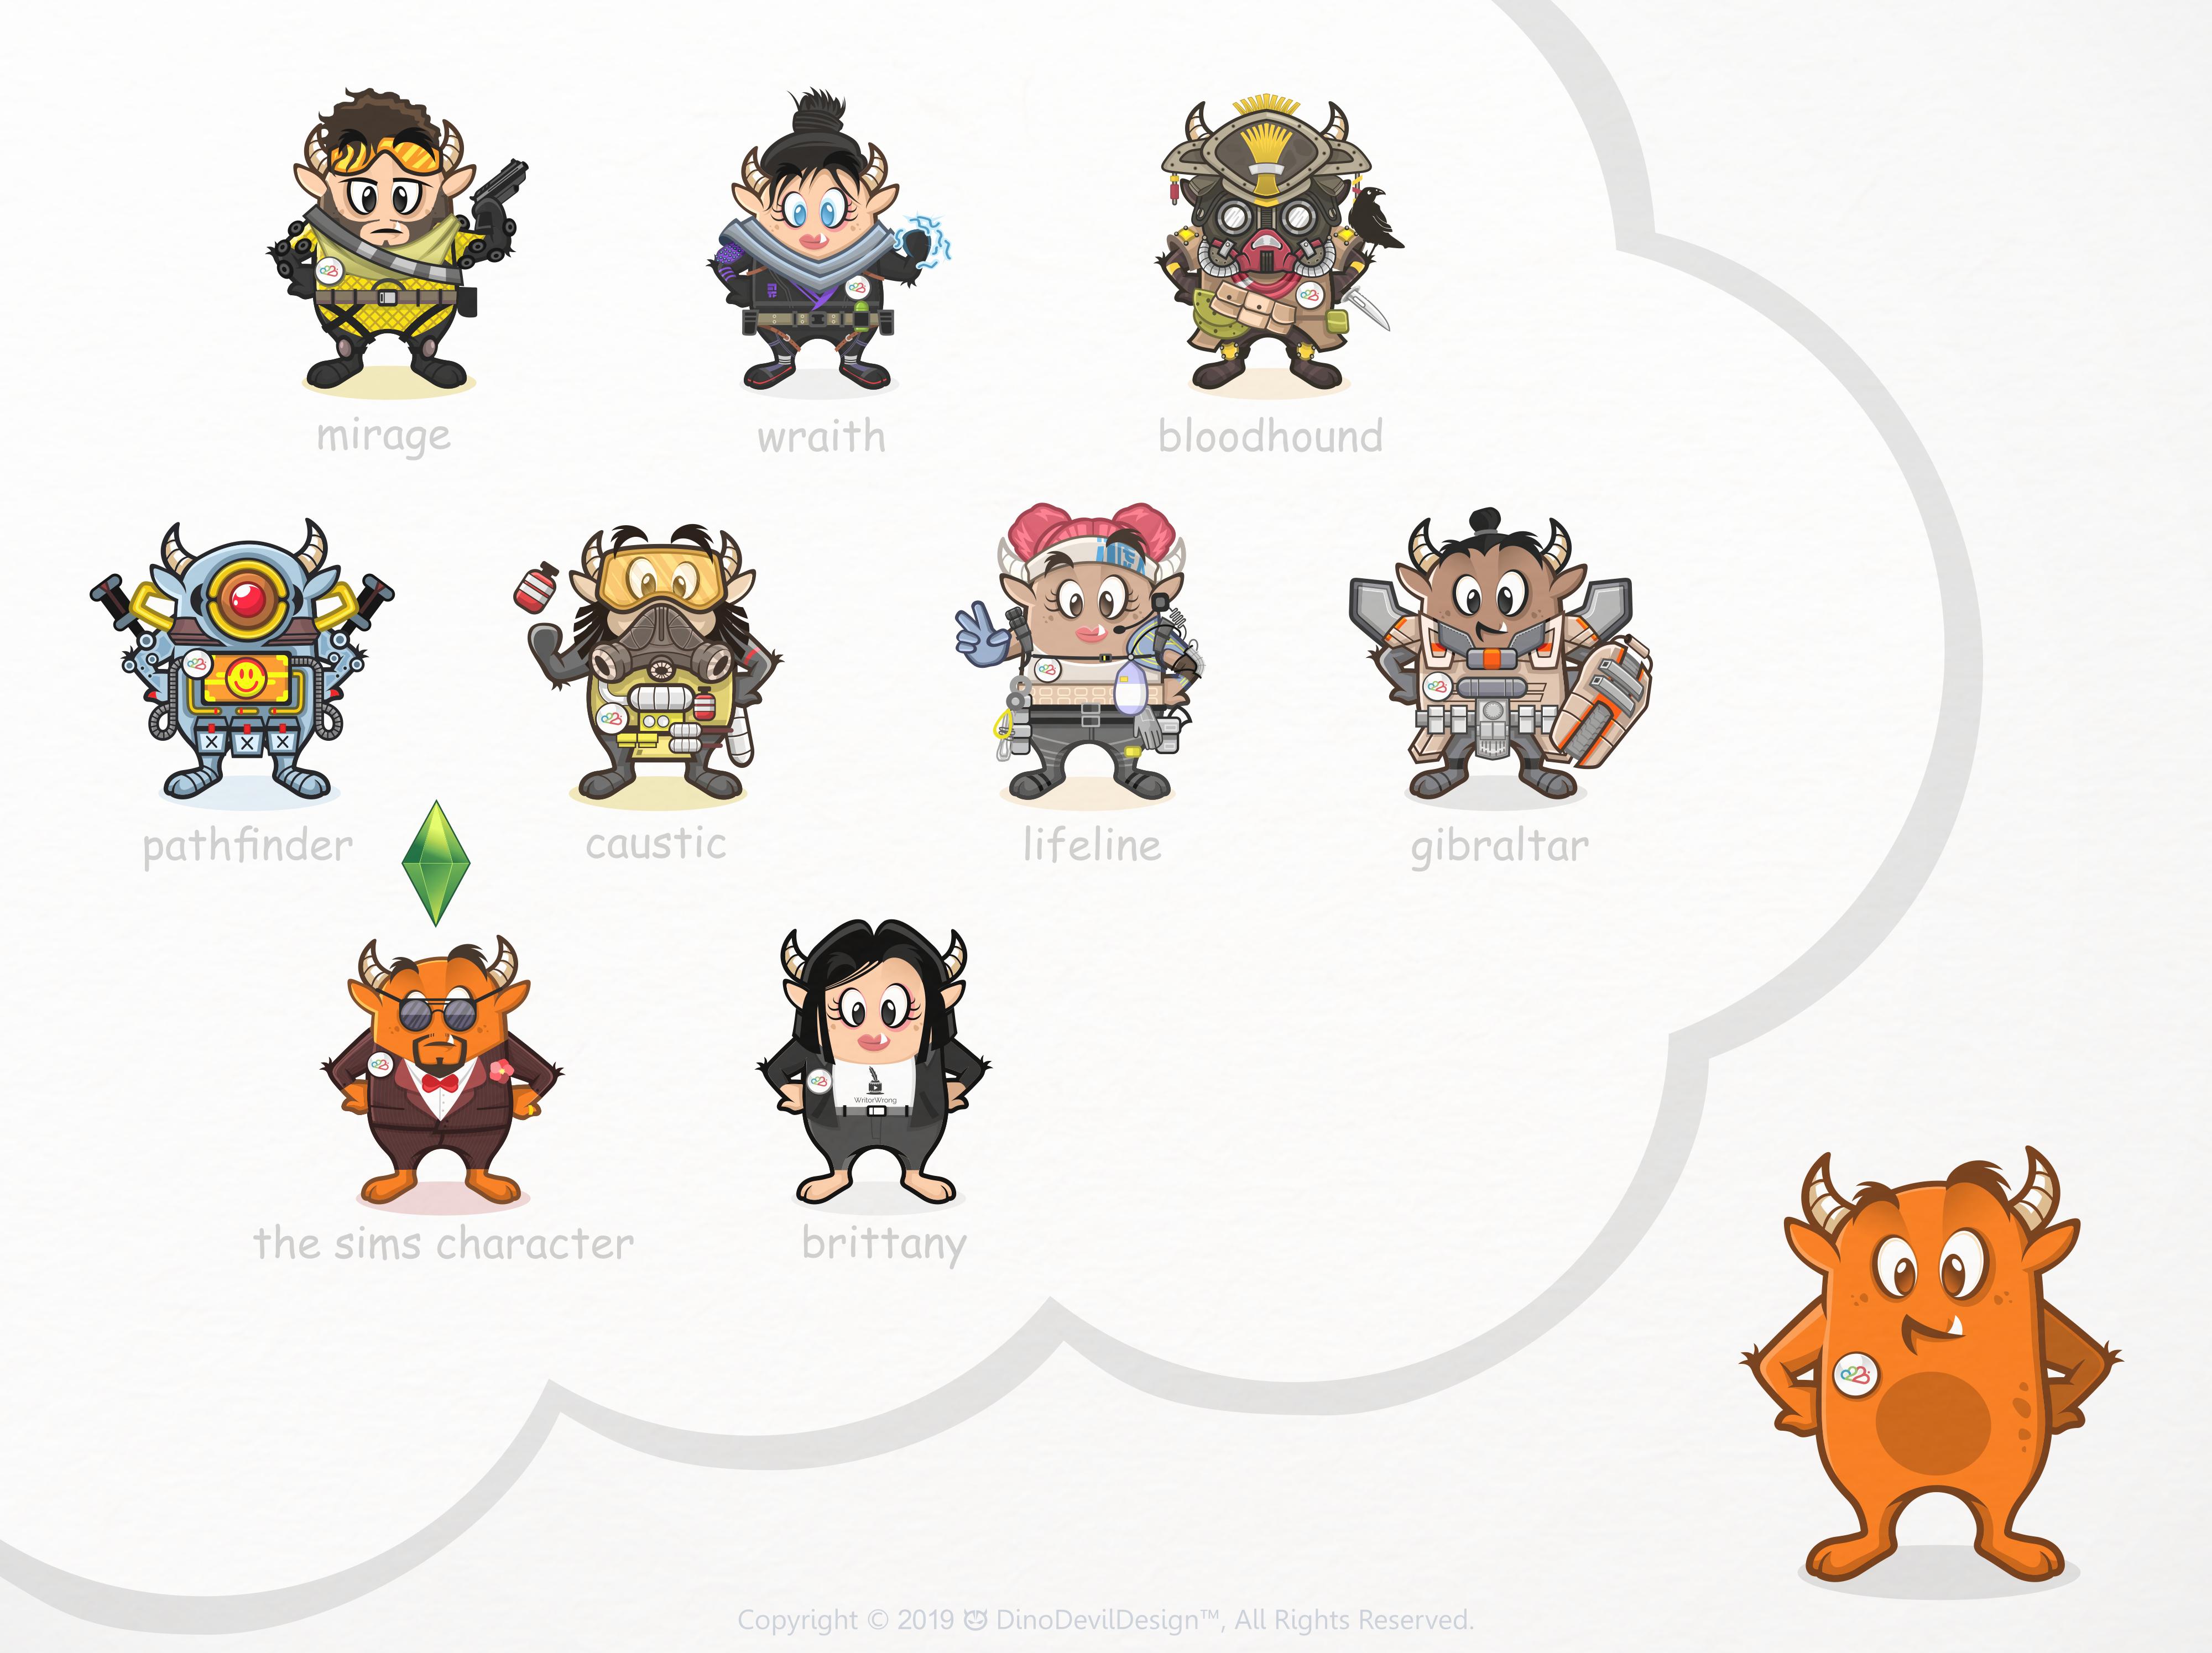 8 More Role.Place Mascot Roles